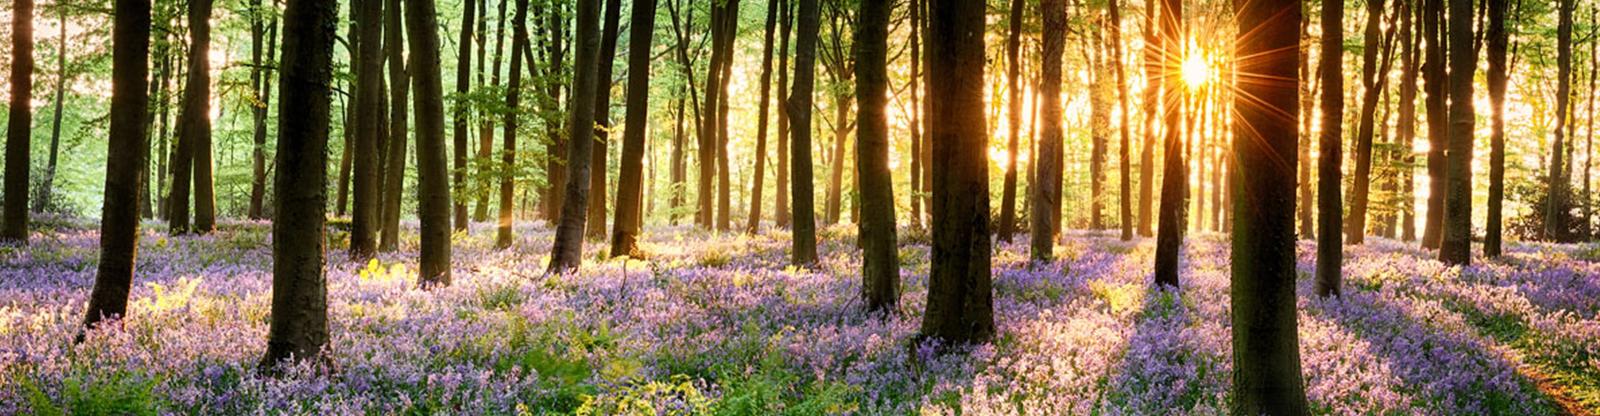 Woodland with sun